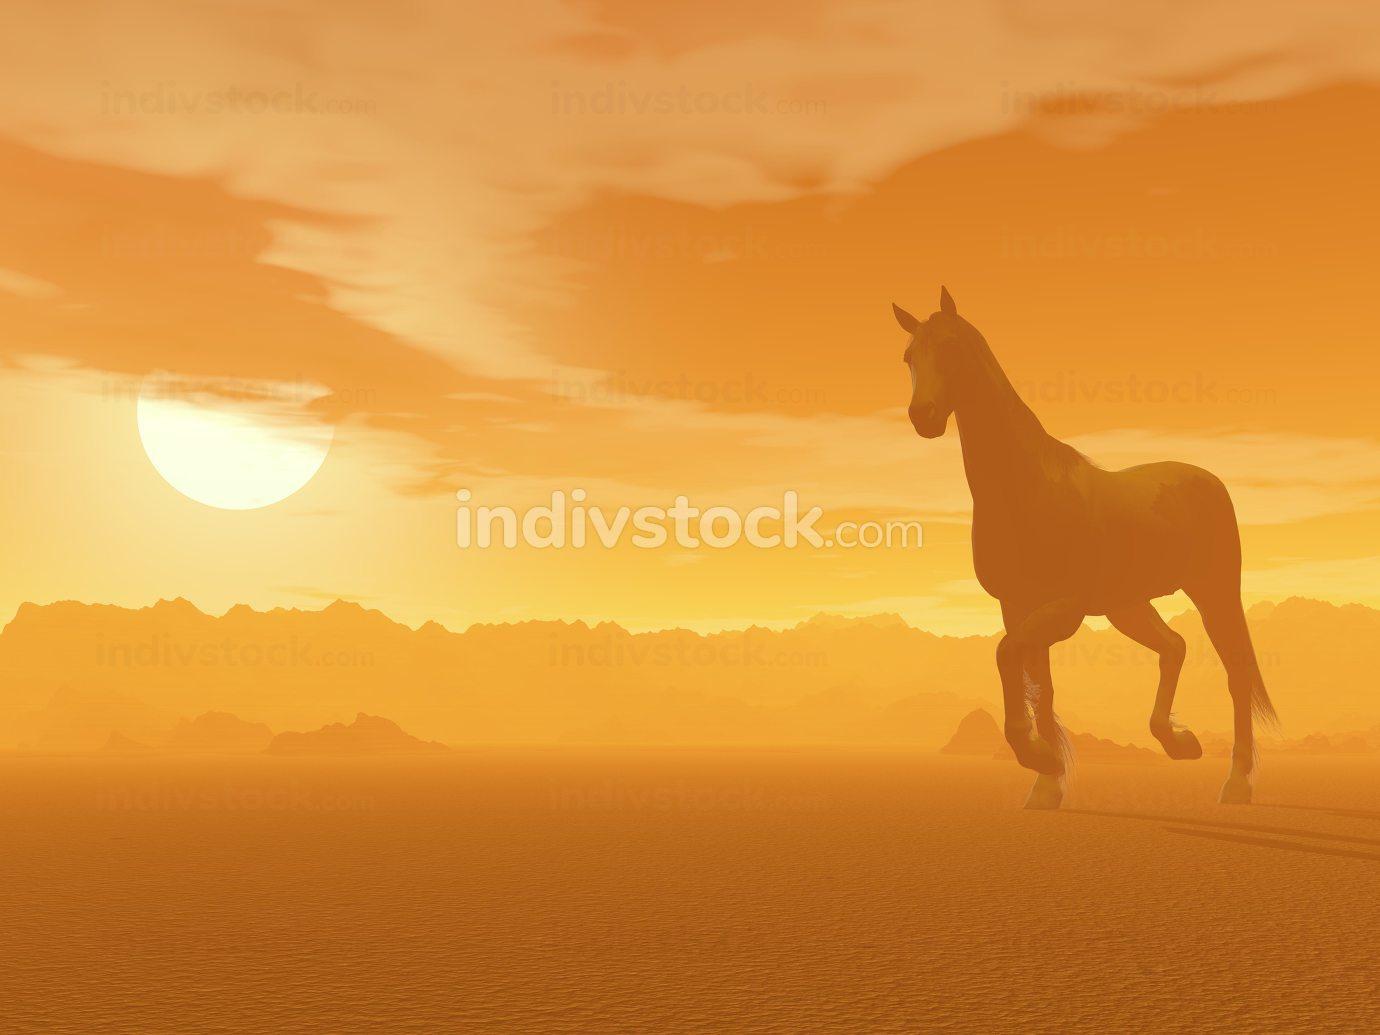 Horse in the desert by sunset - 3D render